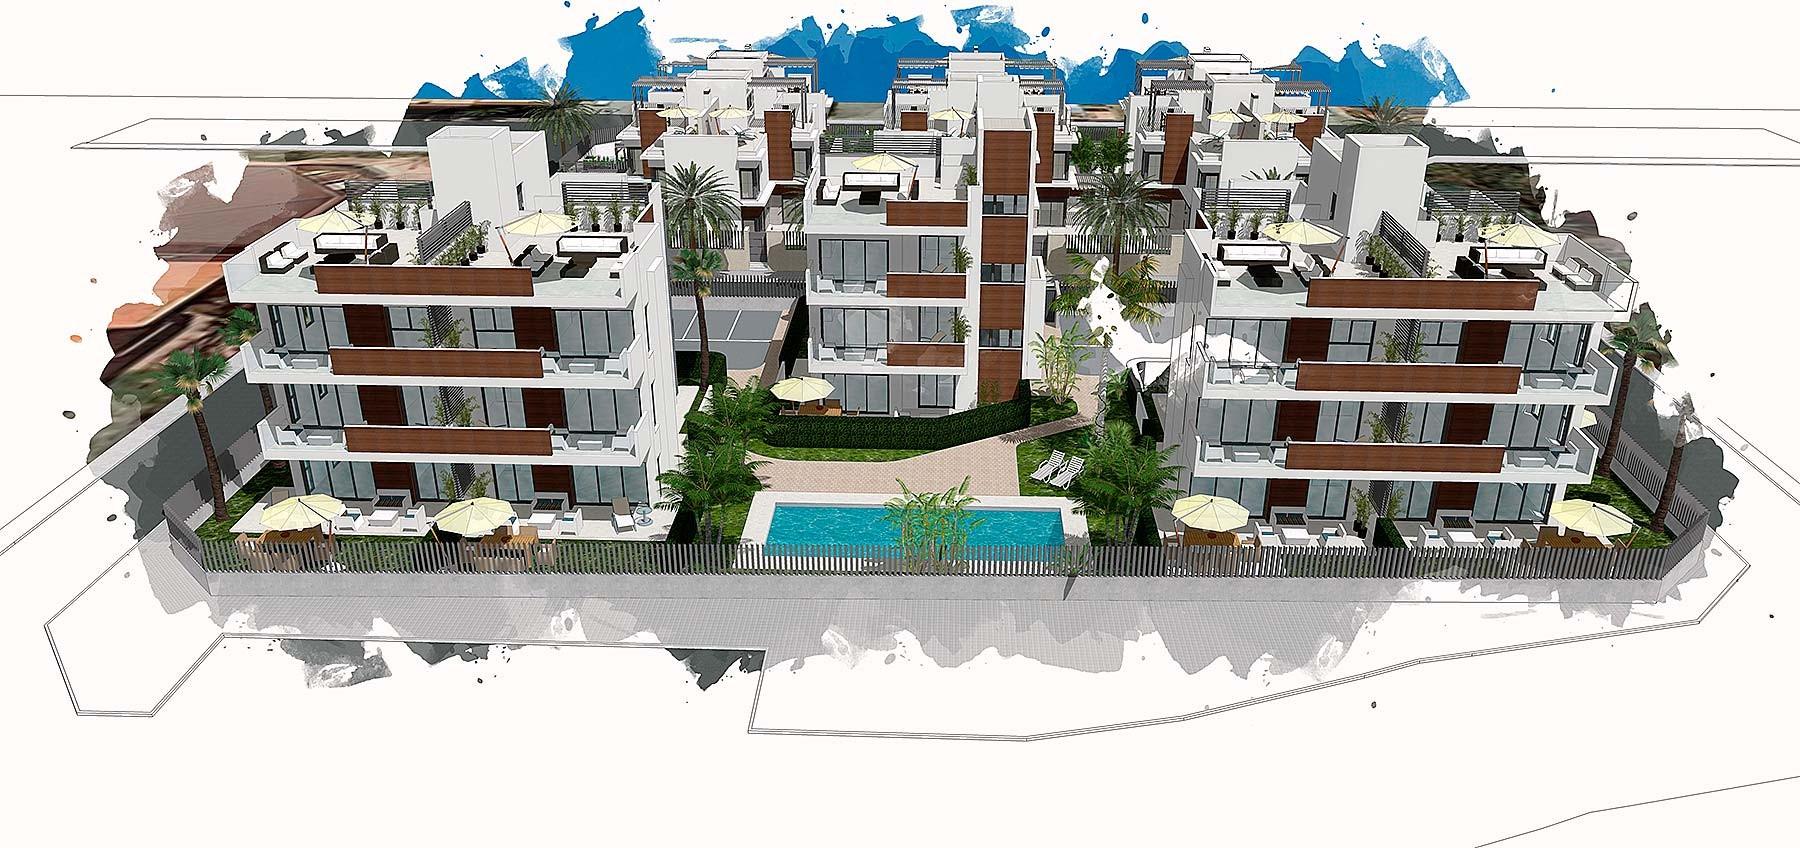 Апартаменты в Ла-Манга-дель-Мар-Менор, 2+1